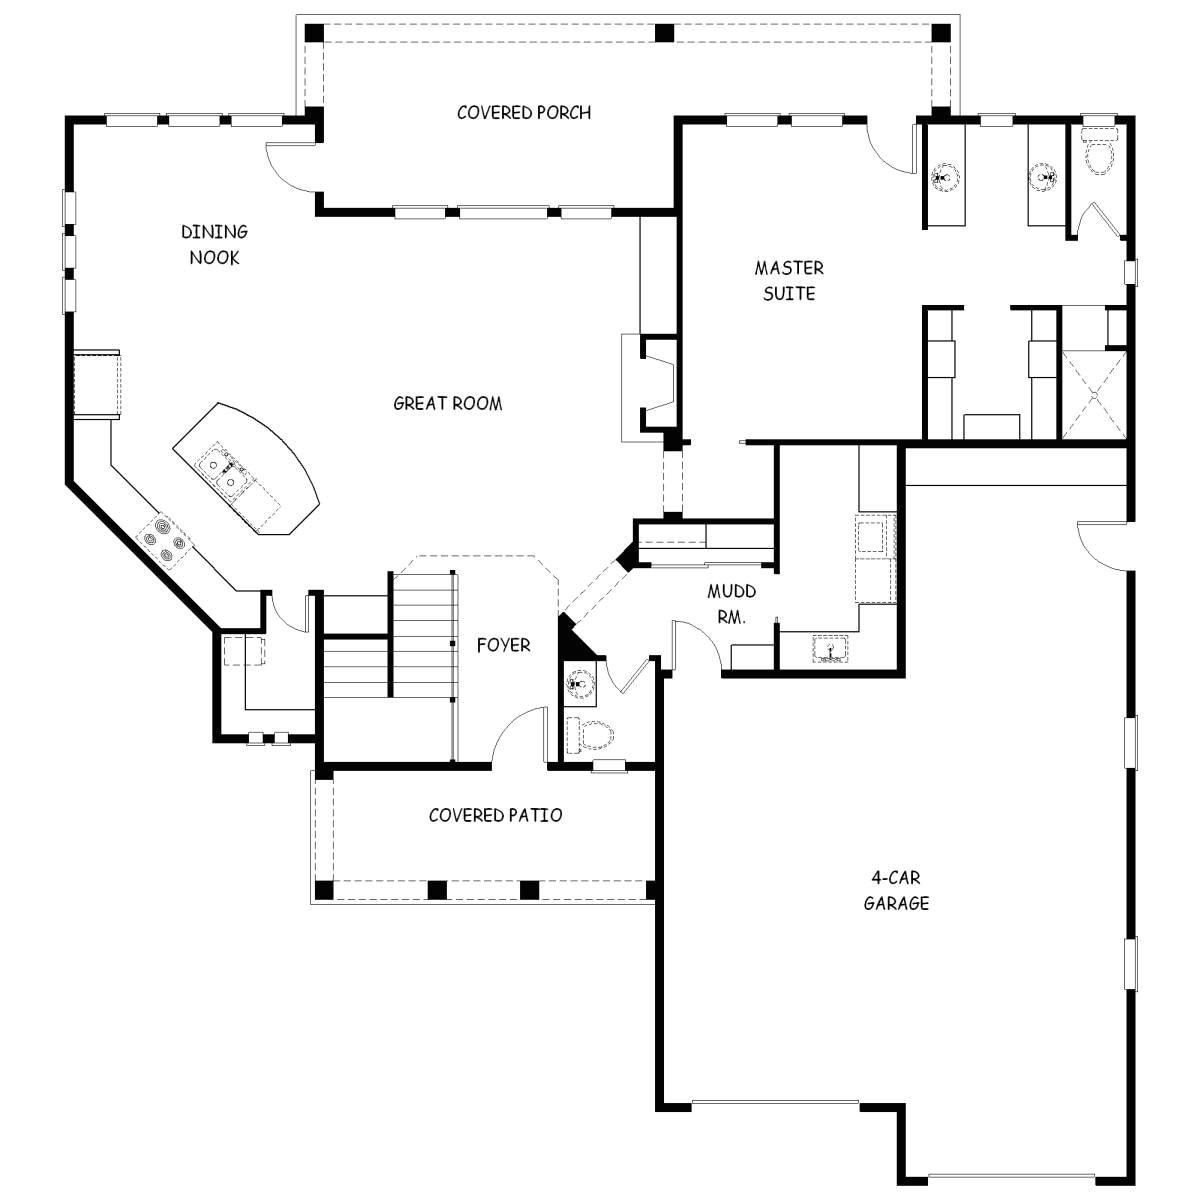 tahoe homes boise floor plans lovely fmci homes a boise idaho home builder